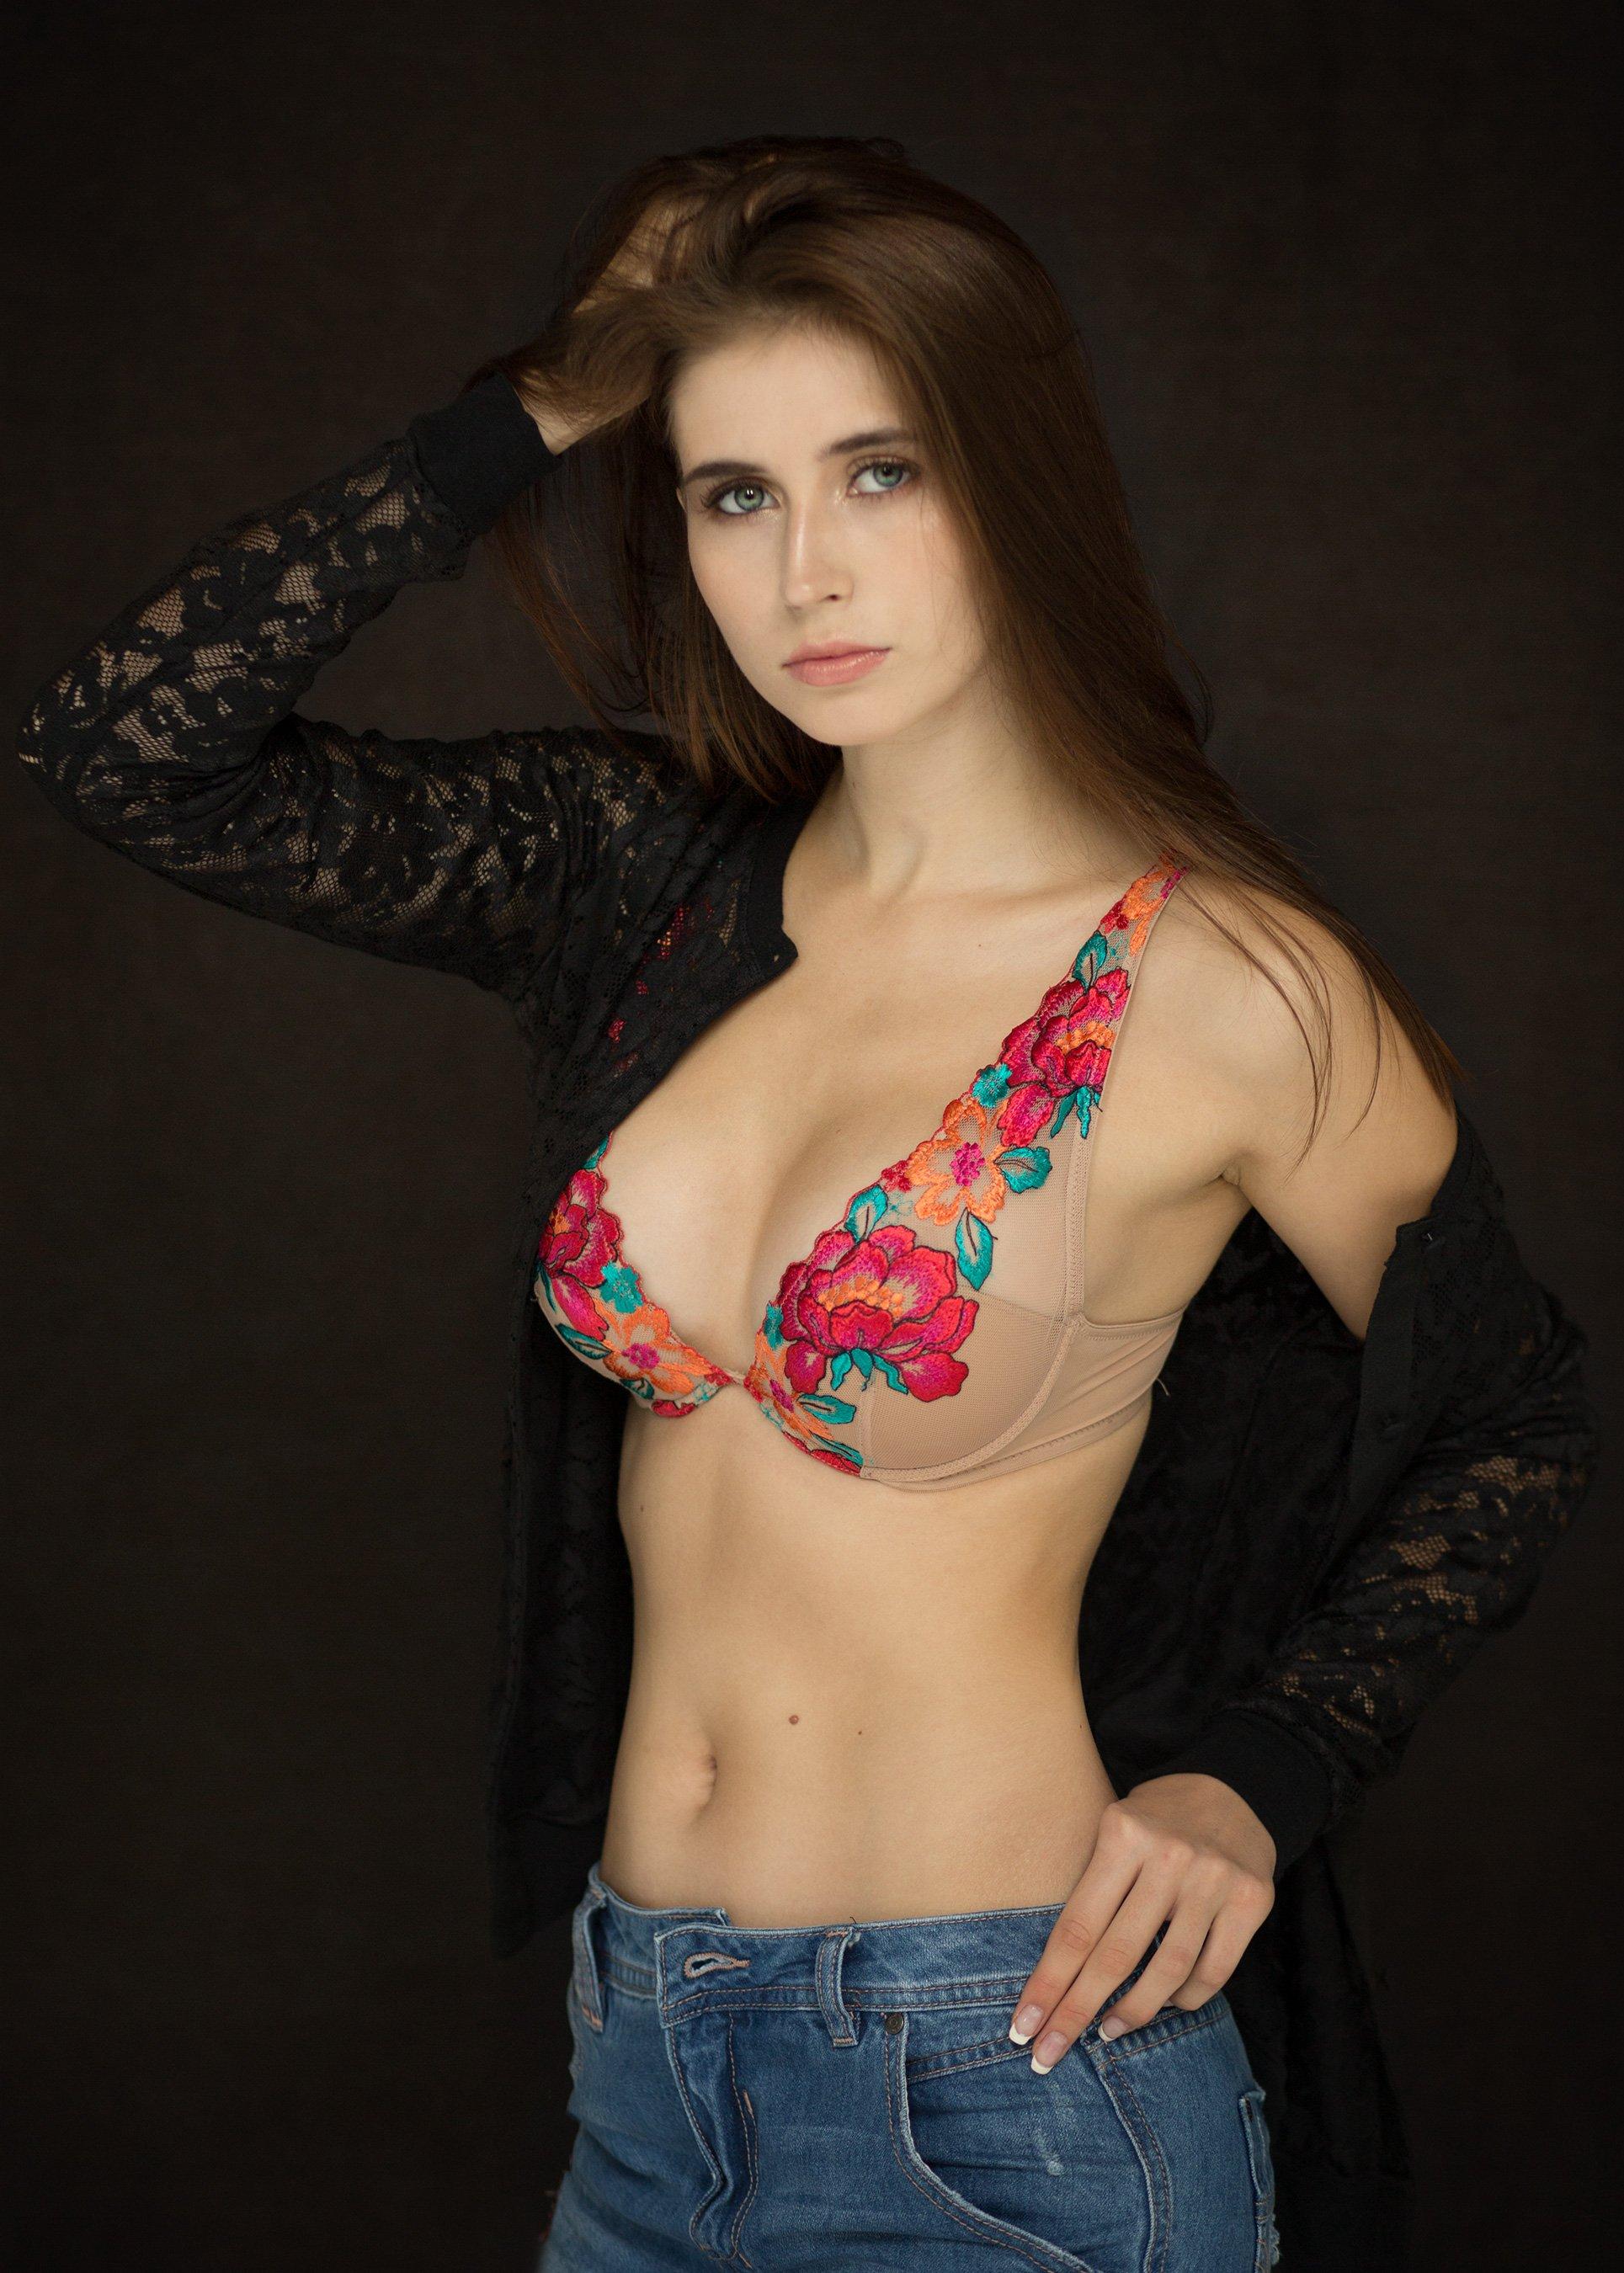 model, girl, beauty, portrait, face, body, hair, eyes, sexy, sensual, Gurulee, ЛЕВАН ТАВАДЗЕ